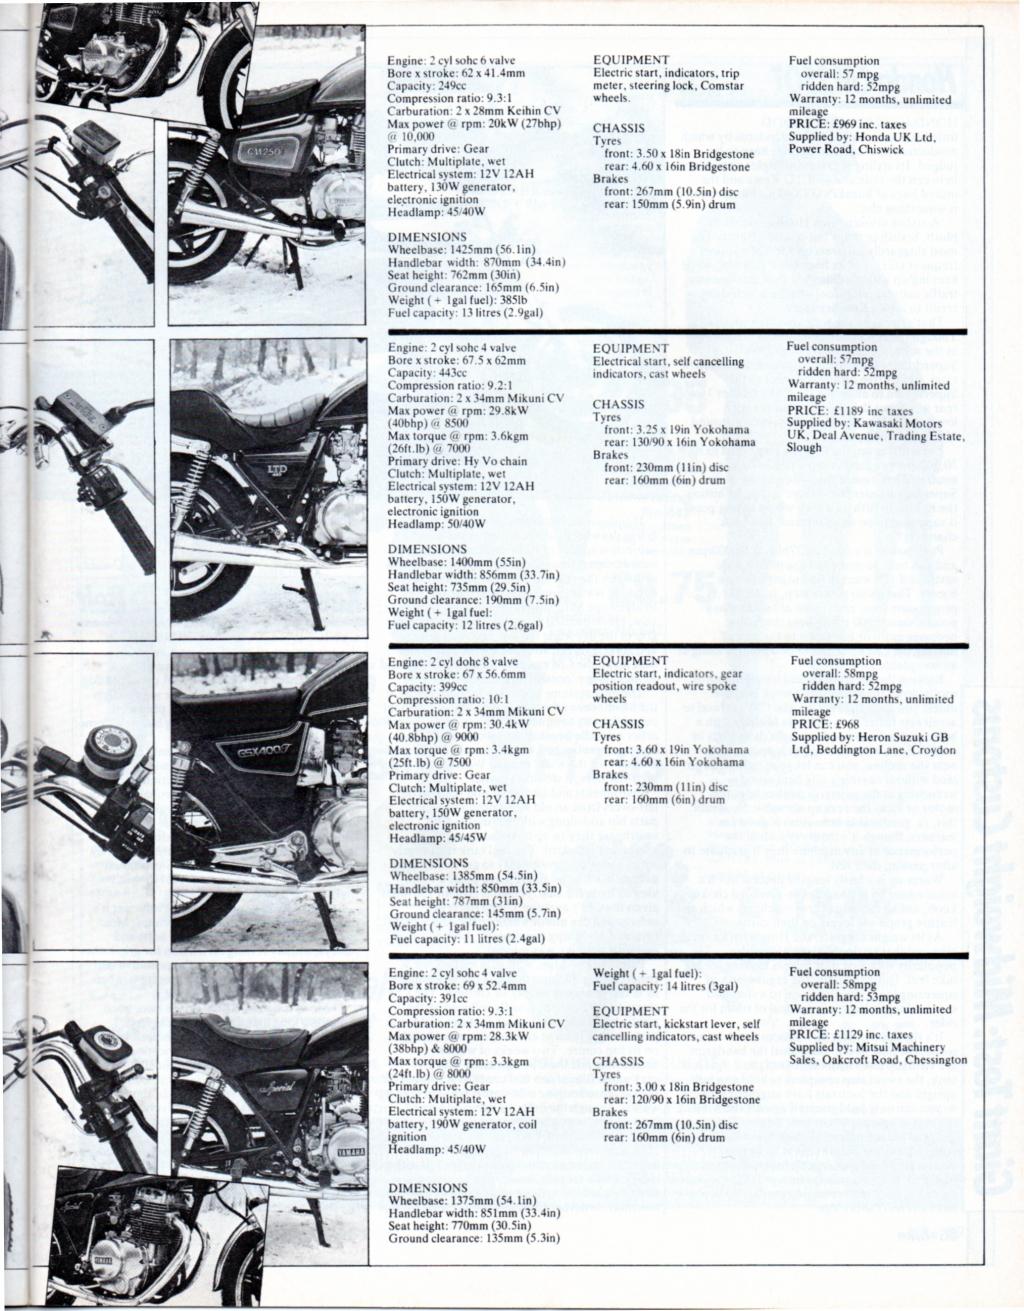 magazine bike avril 1982 essai du z440 ltd belt